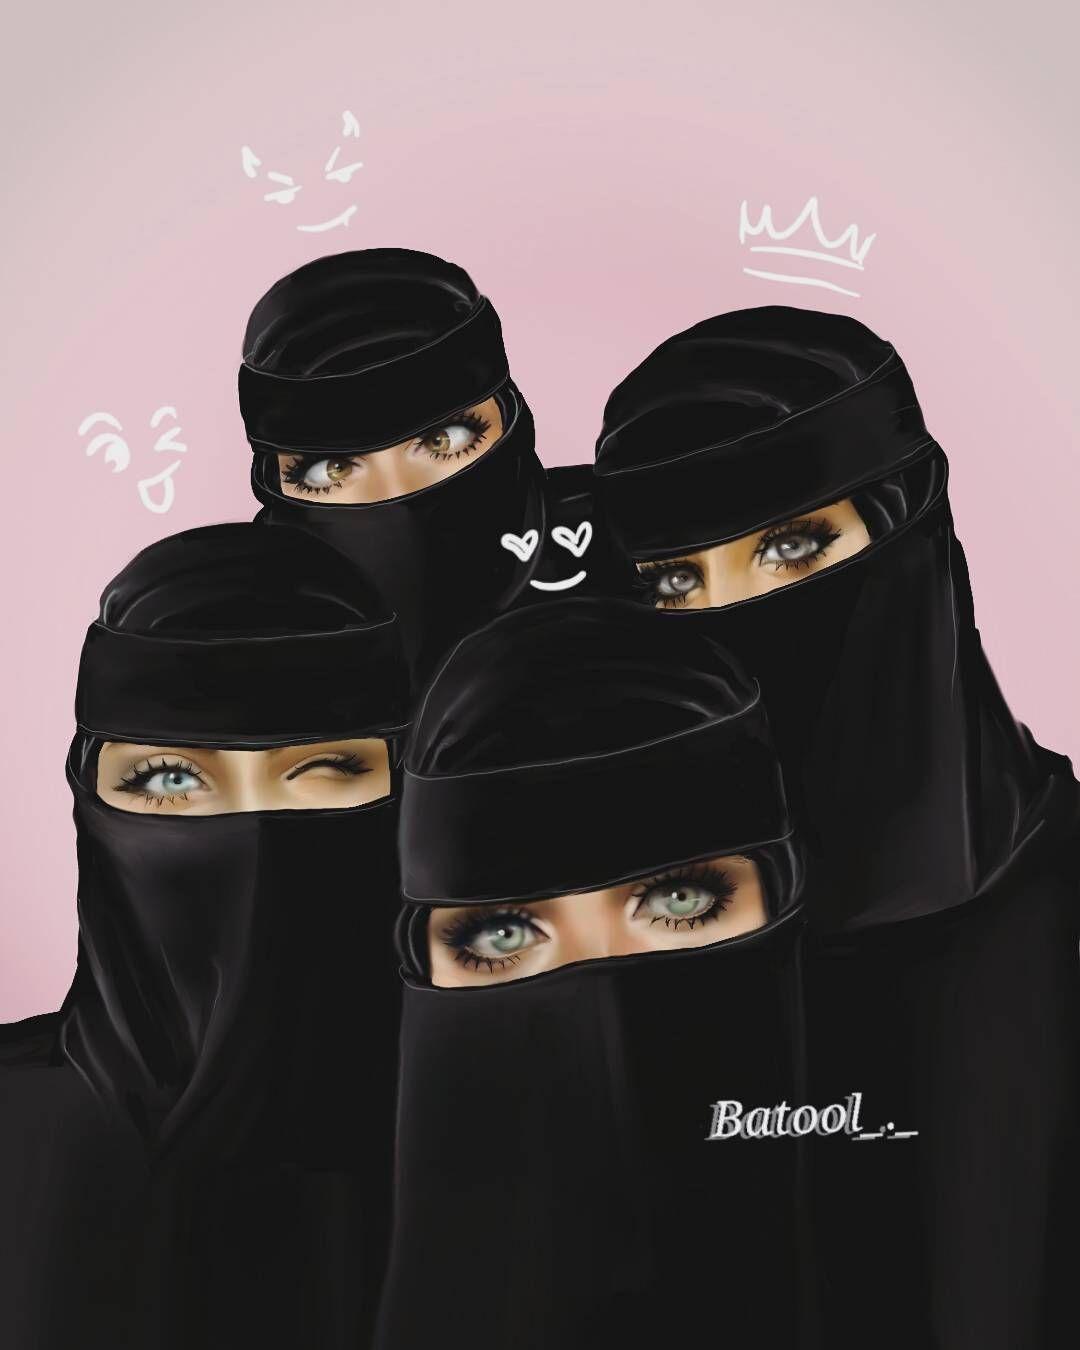 2 355 Likes 126 Comments Vatssℓ Kuwait Batool On Instagram مسائكم جميل صديقات البرنامج الي استخدمه في Cute Cartoon Girl Girly M Cute Girl Drawing